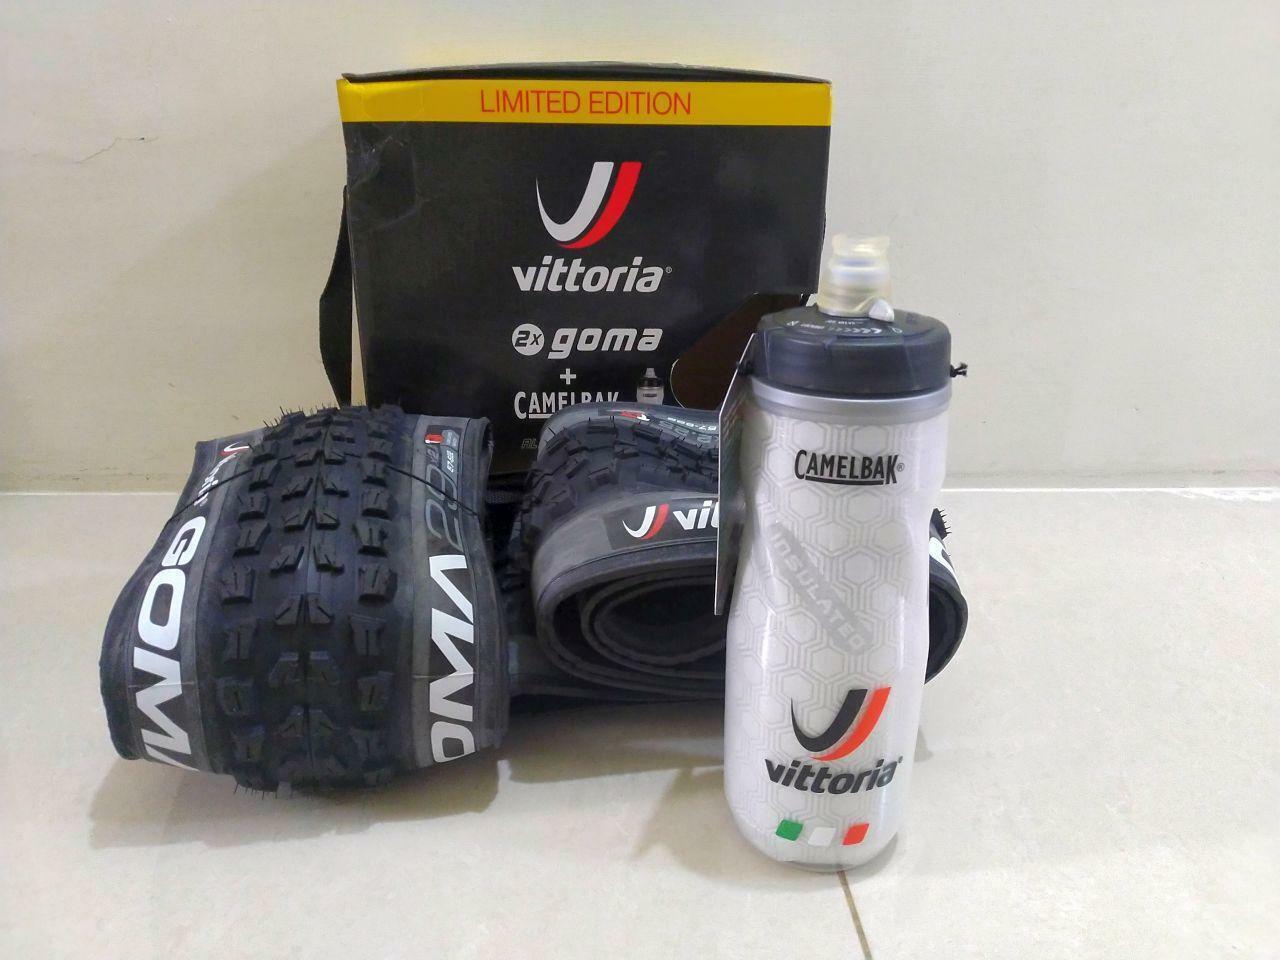 Vittoria GOMA  29X2.25 TNT Folding Tire X2 Plus 1 Camelbak Bottle Limited Edition  60% off